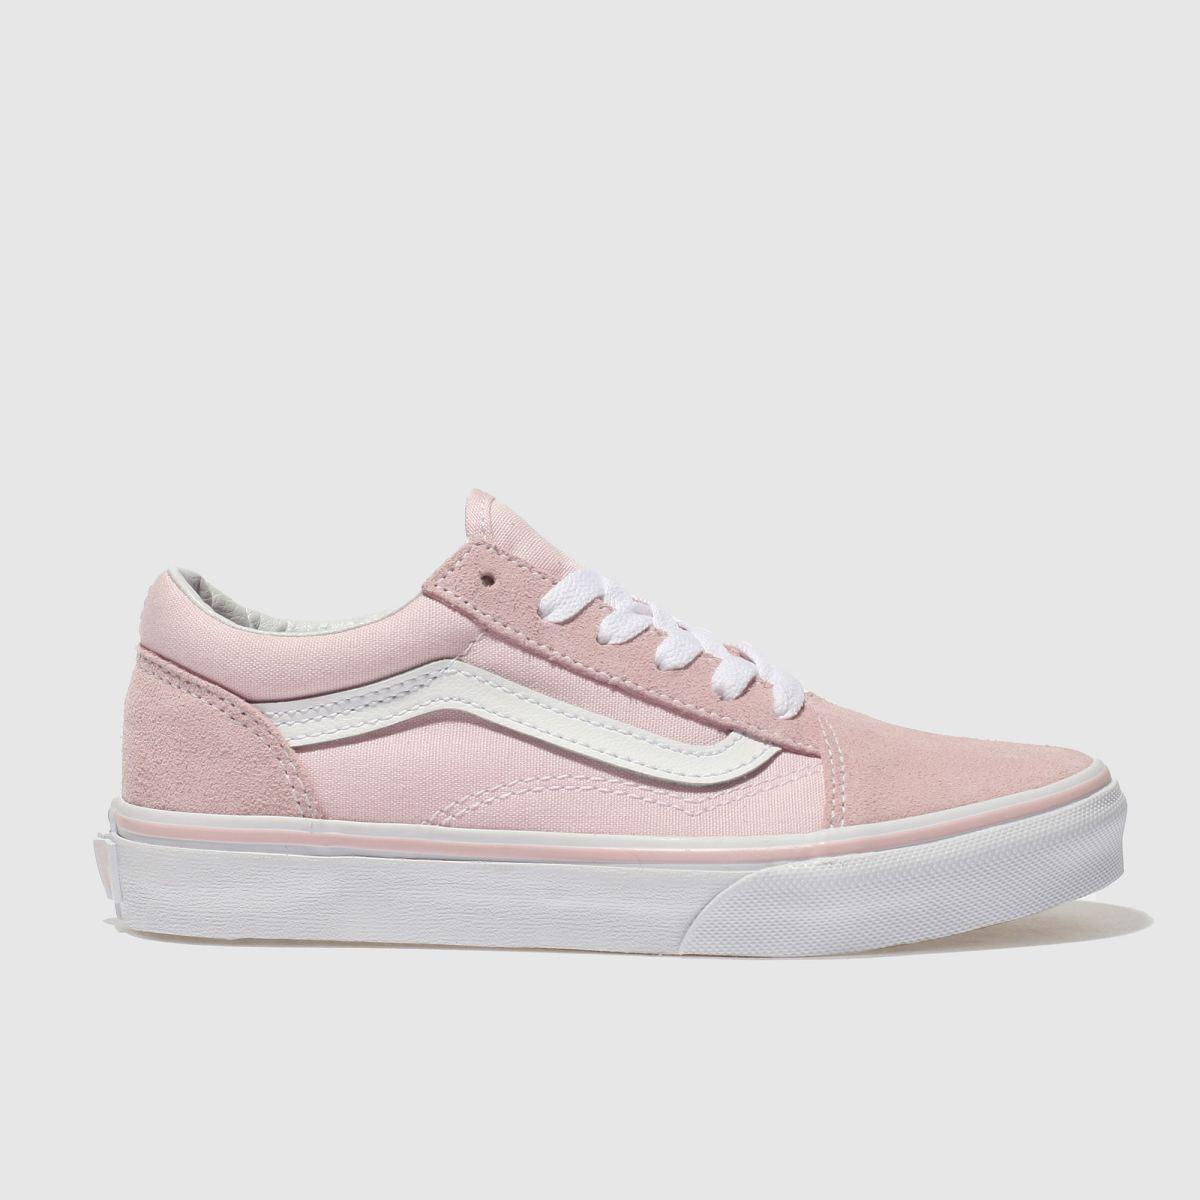 5e02b3604cb Vans Pale Pink Old Skool Trainers Junior